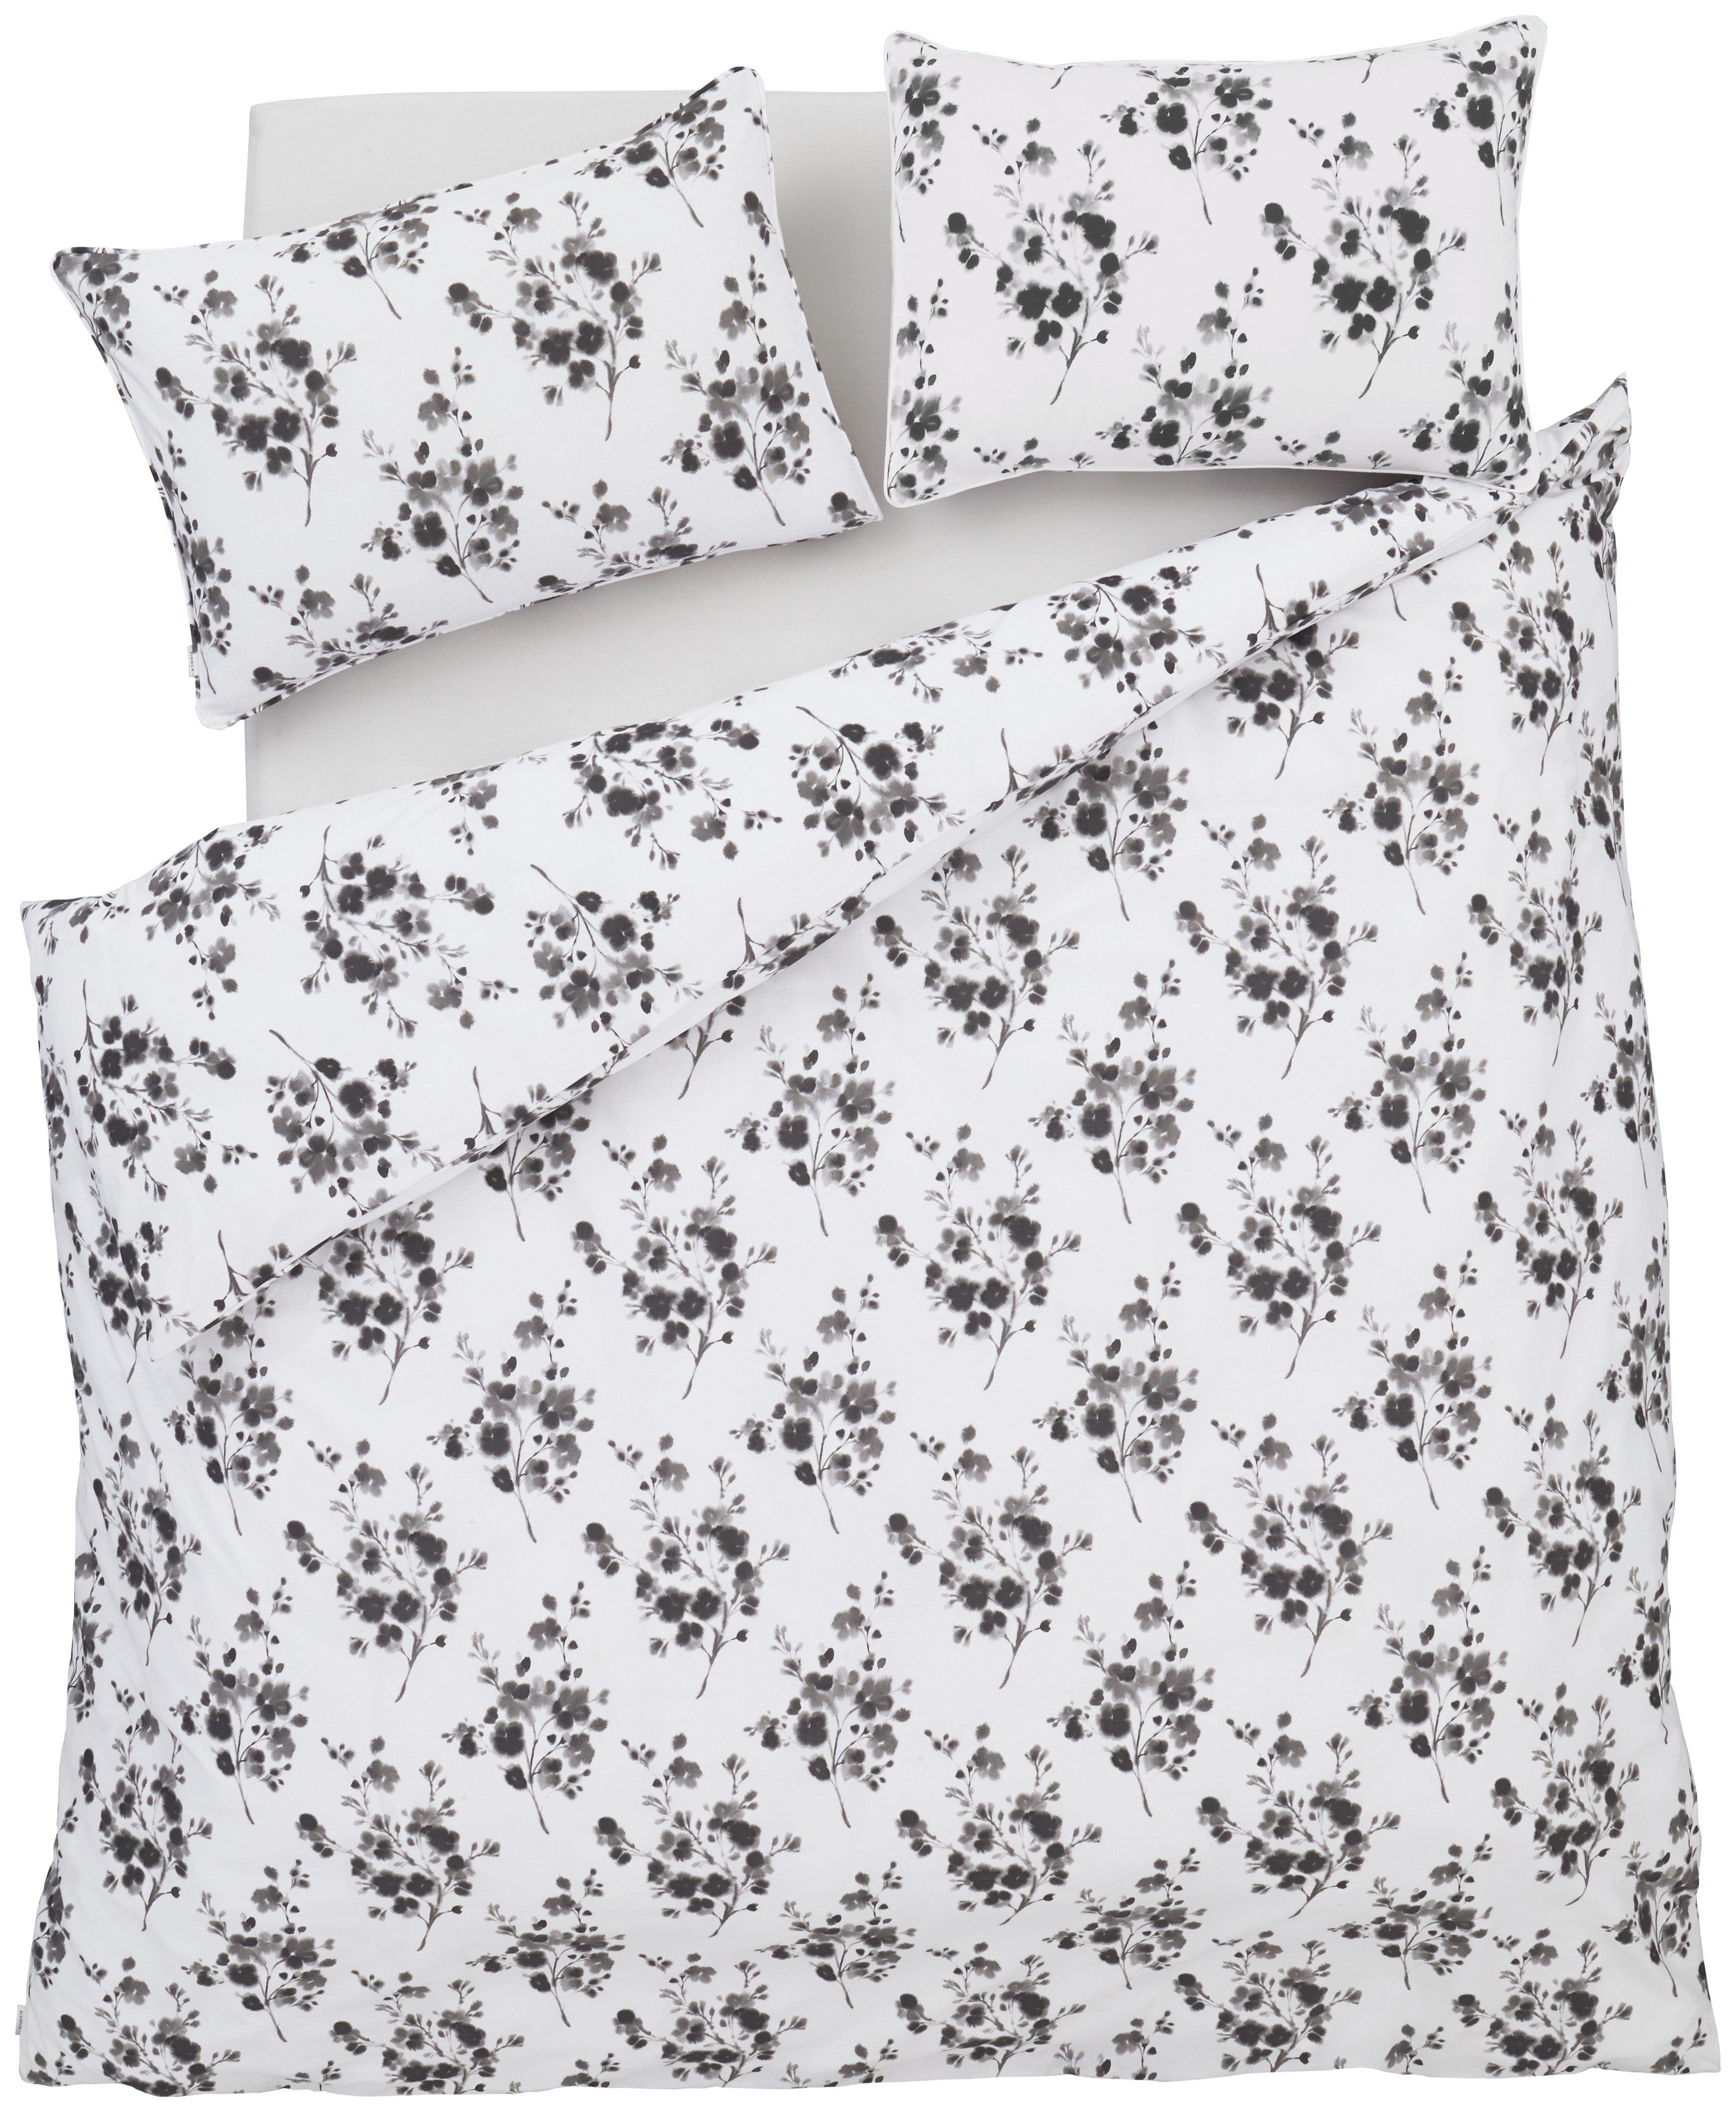 Bianca Cotton Soft Sprig Grey Duvet Cover Set Kingsize : 6705976RZ001A from furniturecompare.uk size 3507 x 4266 jpeg 1689kB